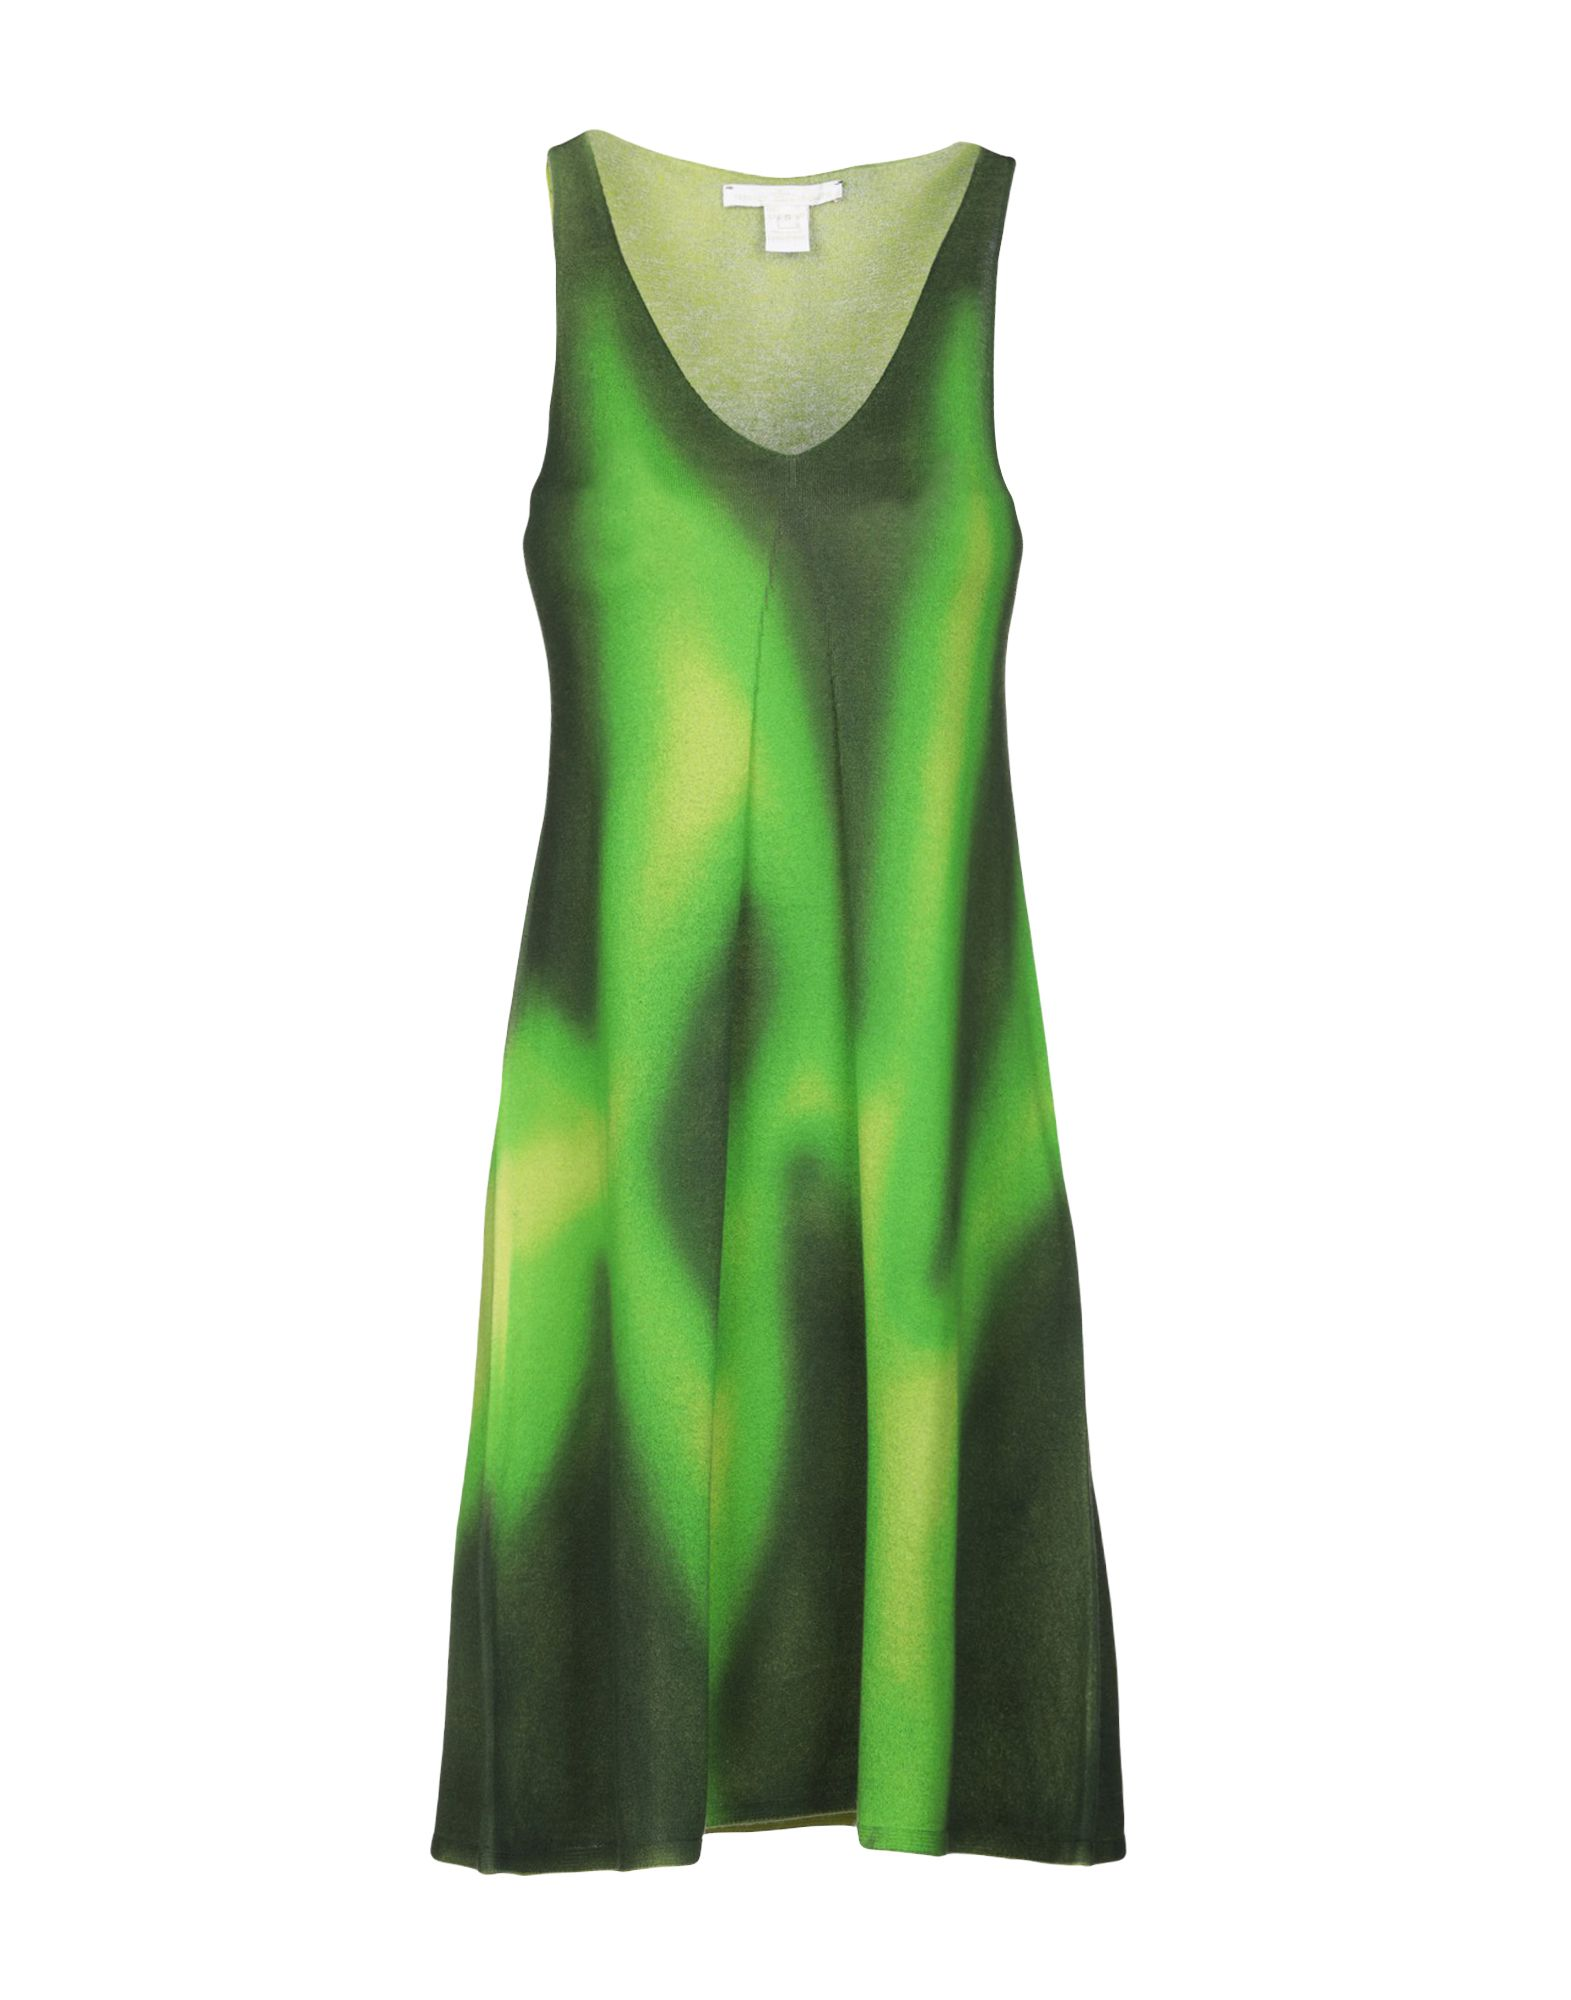 Фото - TABARONI CASHMERE Платье до колена autumn cashmere платье до колена